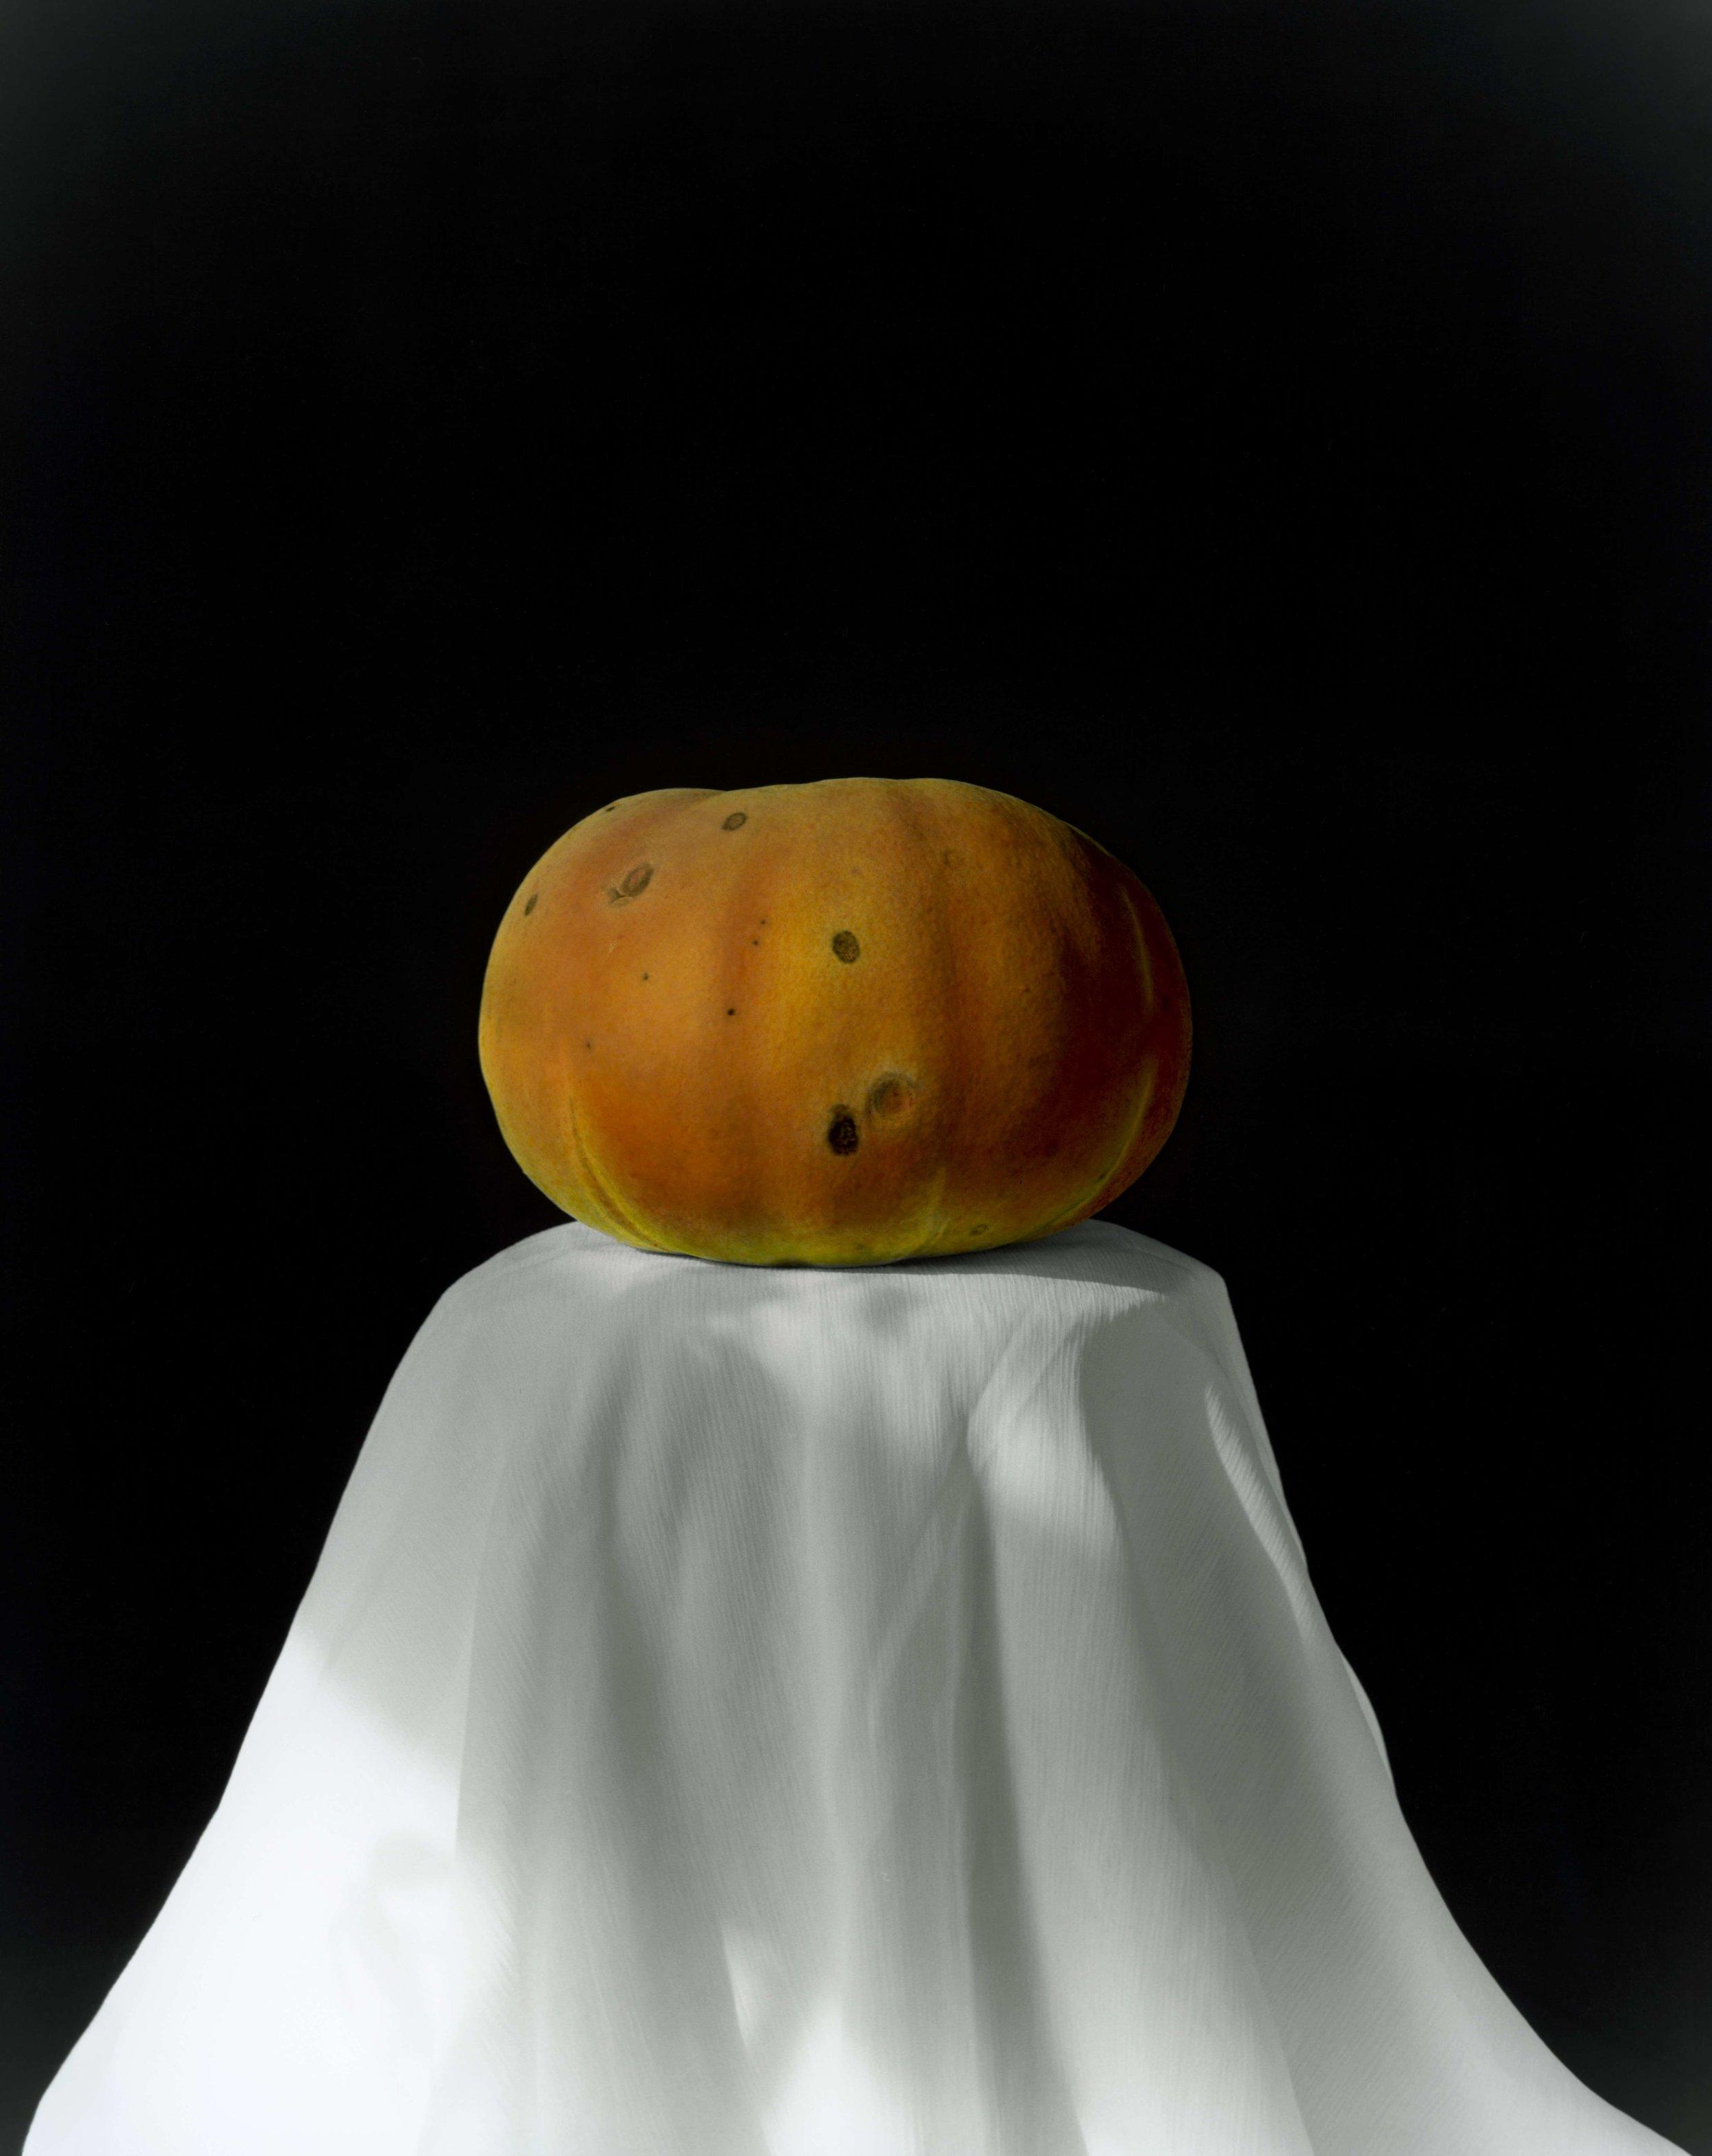 黄磊 南瓜 2008 (2-1)  明胶卤化银黑白照片,手工油彩着色 60.5×49.5 cm 2008  Huang Lei, Pumpkin 2008 (2-1), hand dyed with oil colour on gelatin silver print_compressed.jpg